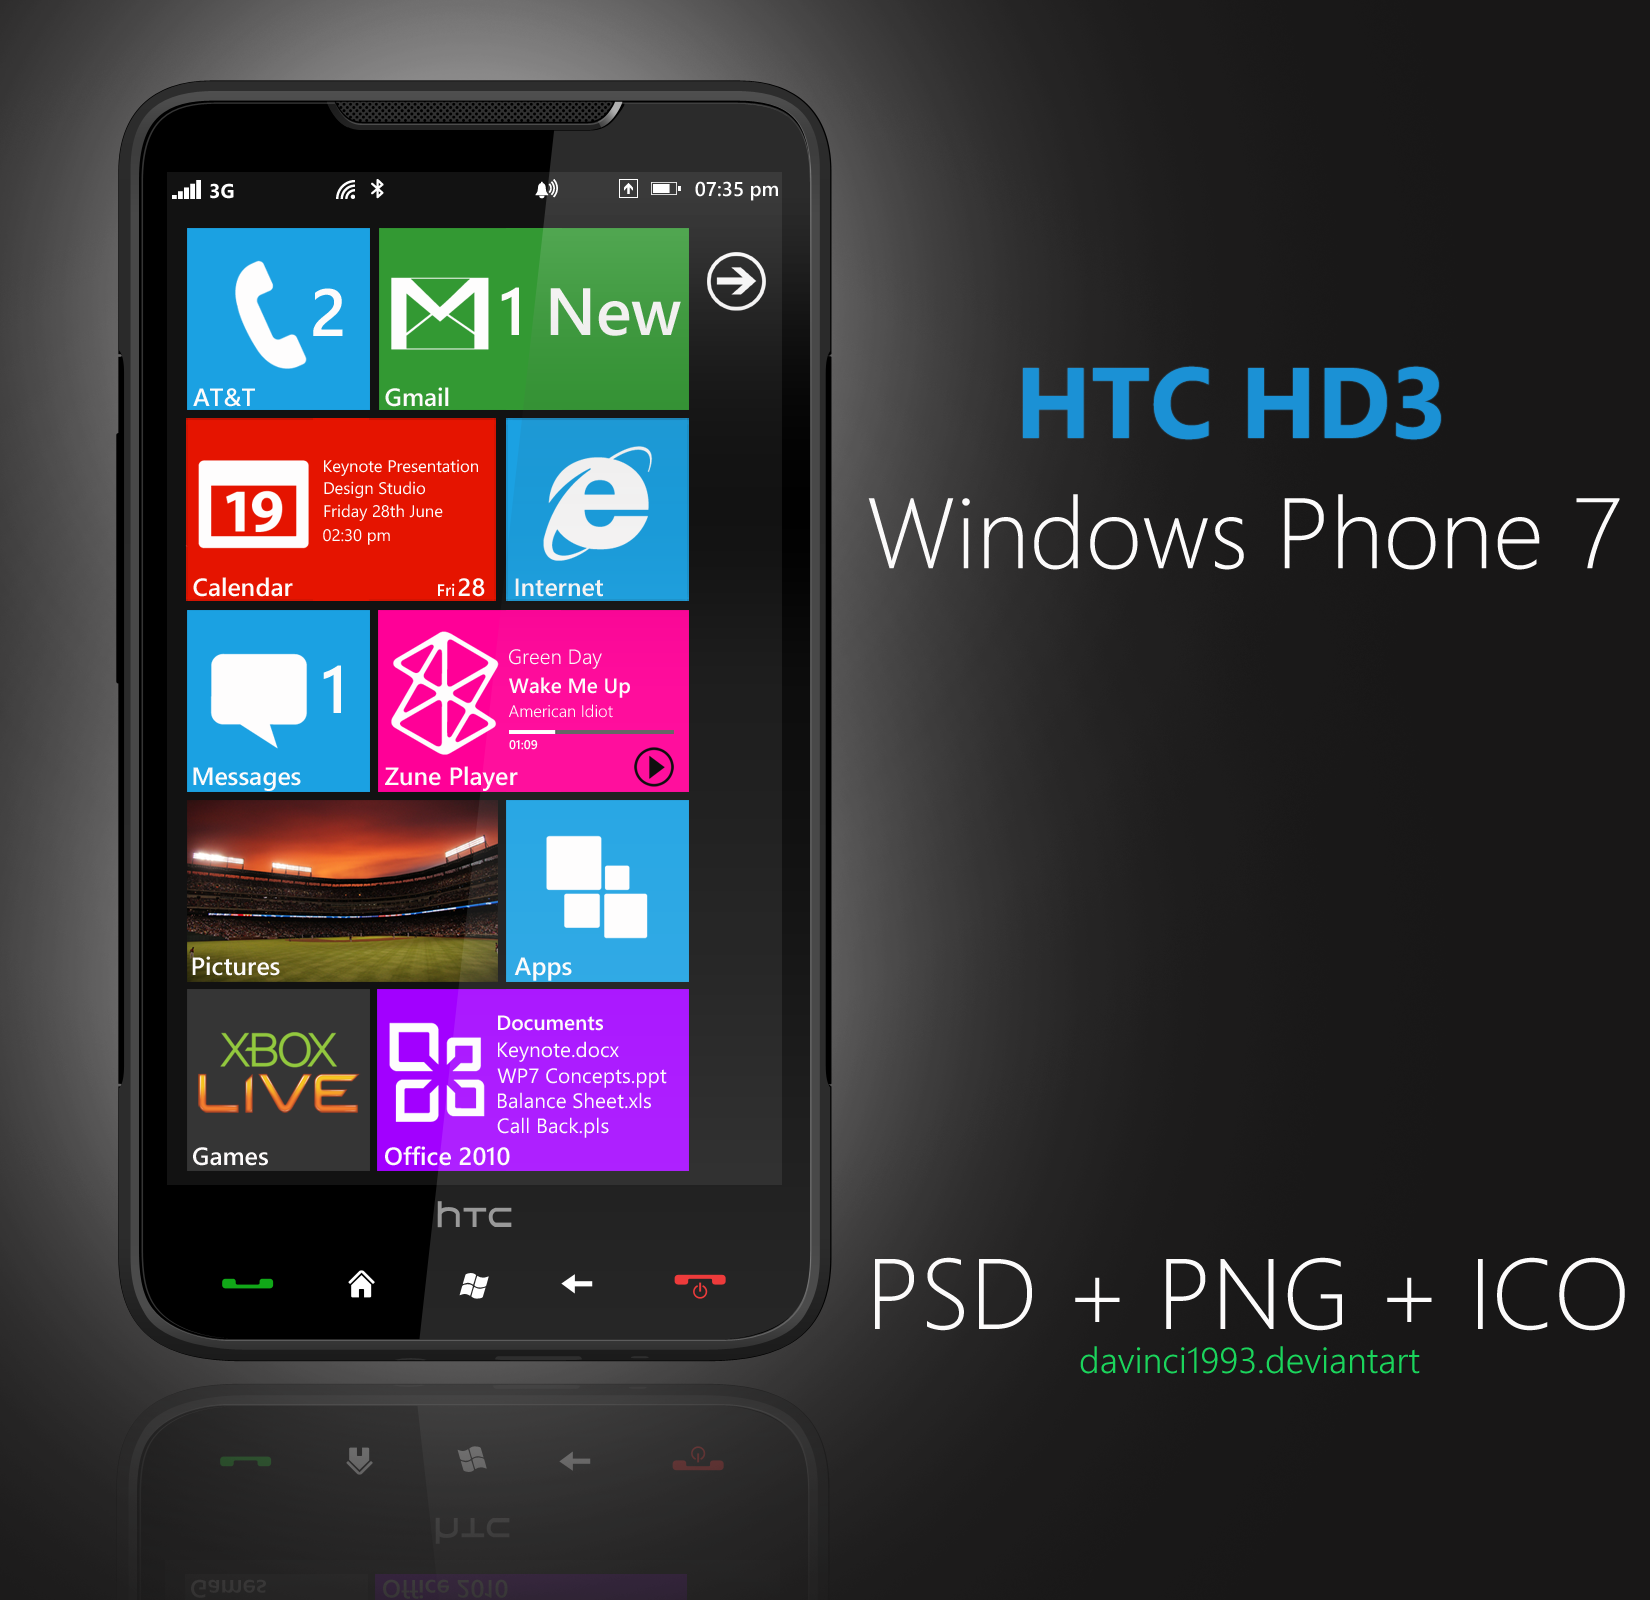 HTC HD3: PSD + PNG + ICO by davinci1993